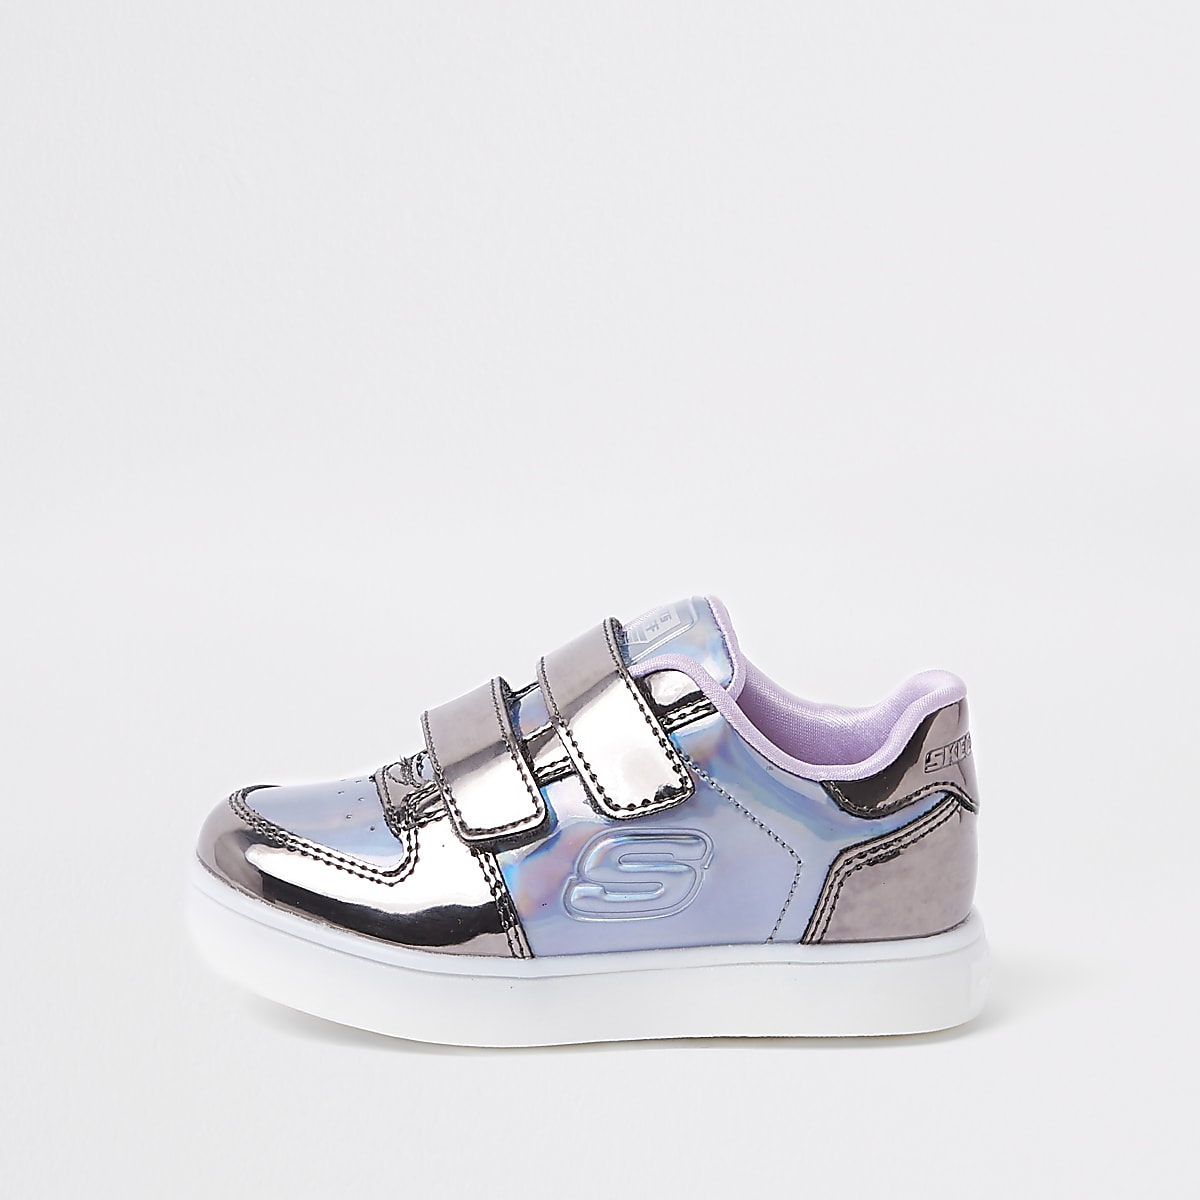 0e445b46822c Mini girls Skechers purple light-up trainers - Baby Girls Trainers - Baby  Girls Shoes   Boots - Mini Girls - girls